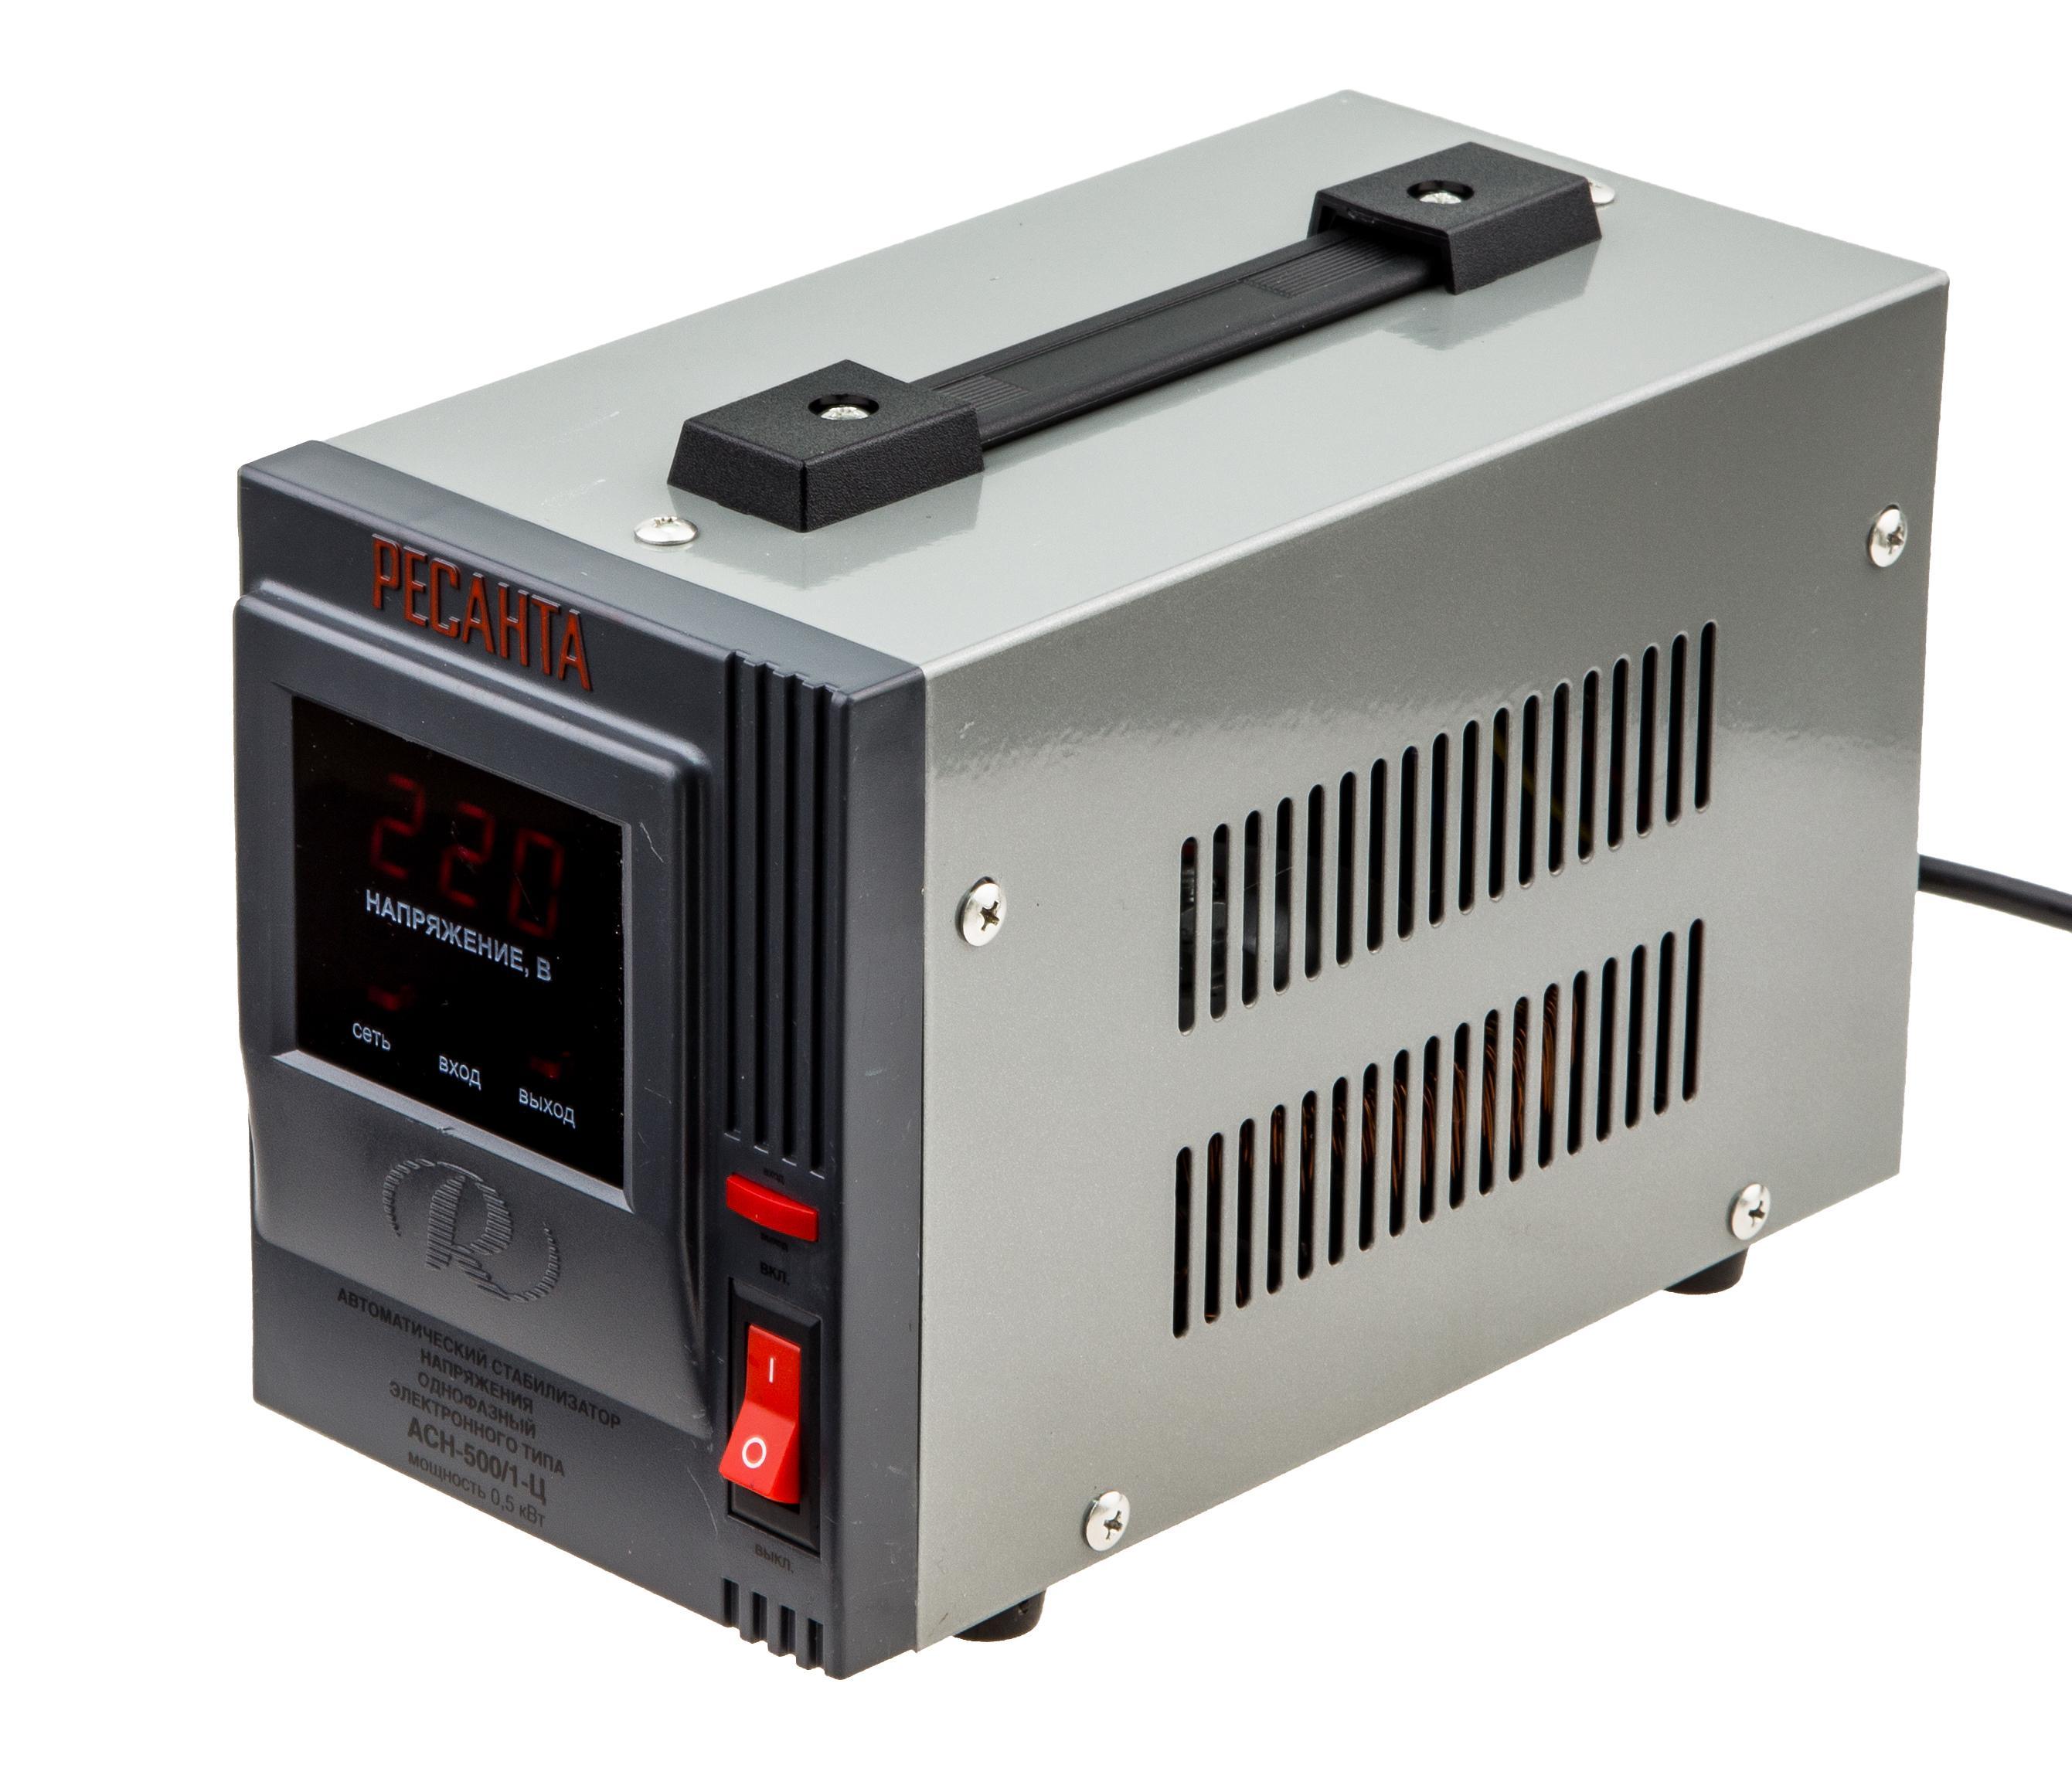 РЕСАНТА АСН-500/1-Ц Стабилизатор Асн-500/ 1-ц Напряжение: 220 В, Мощность (ВА)...